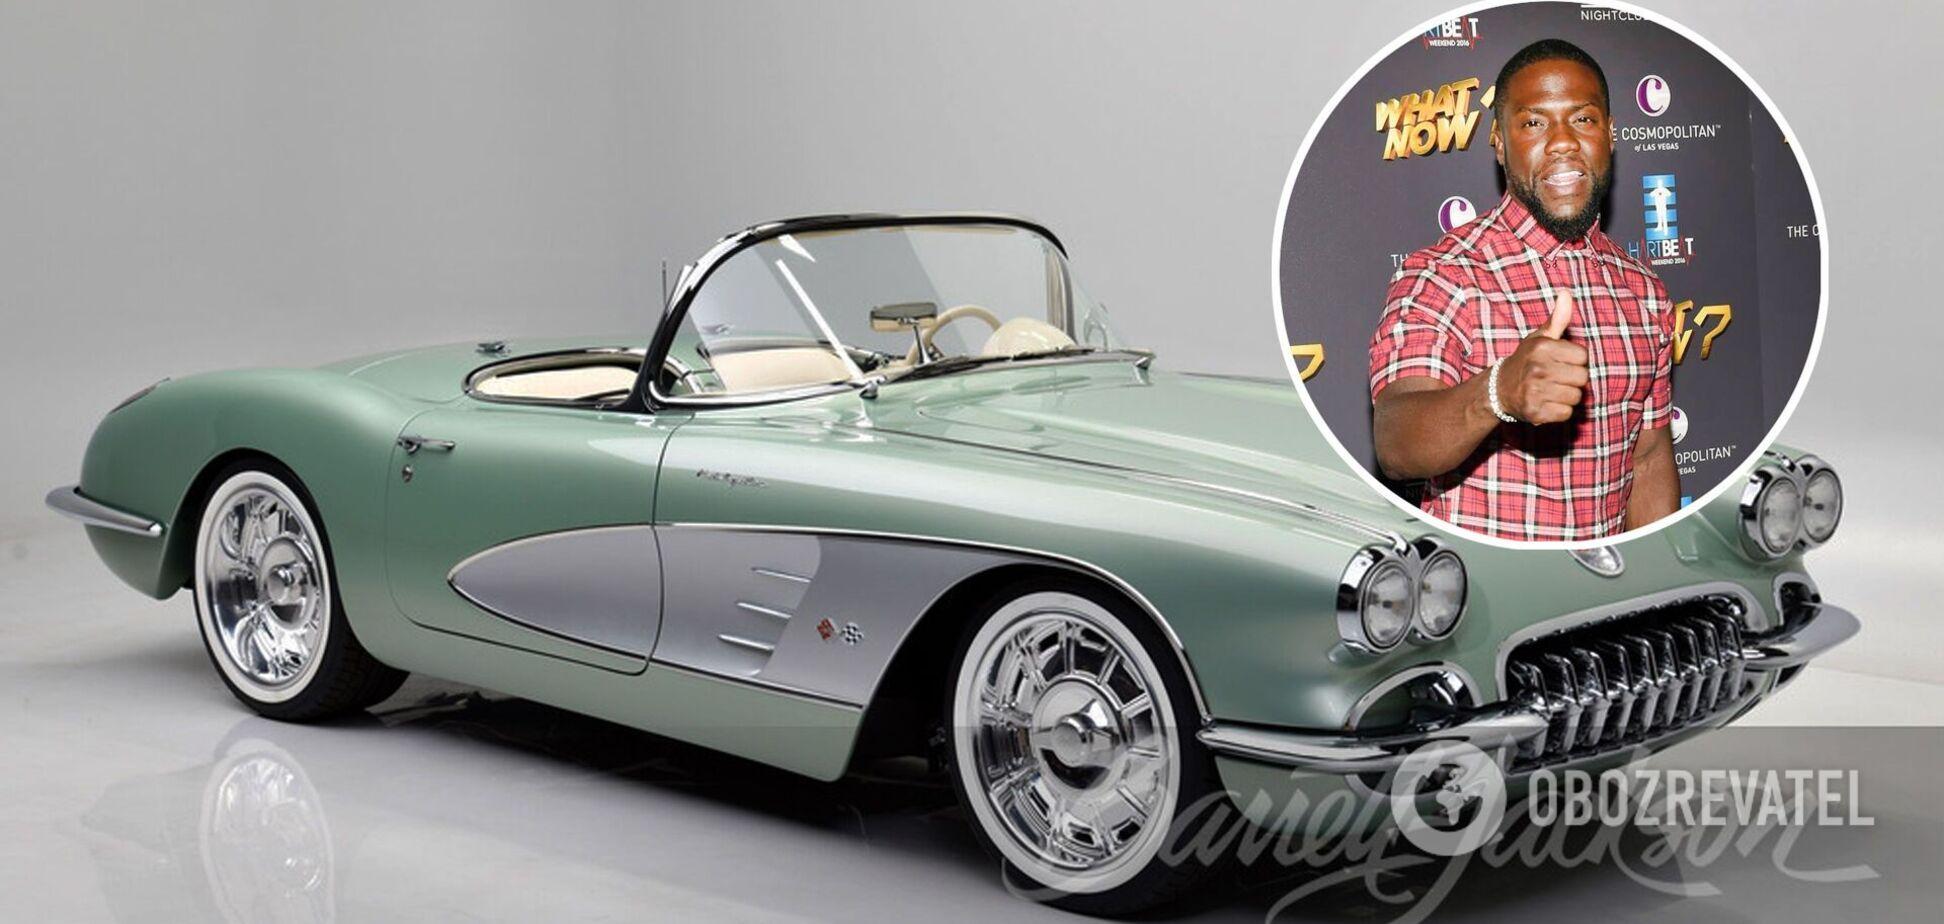 Кевин Харт приобрел рестомод Corvette за $825 тысяч